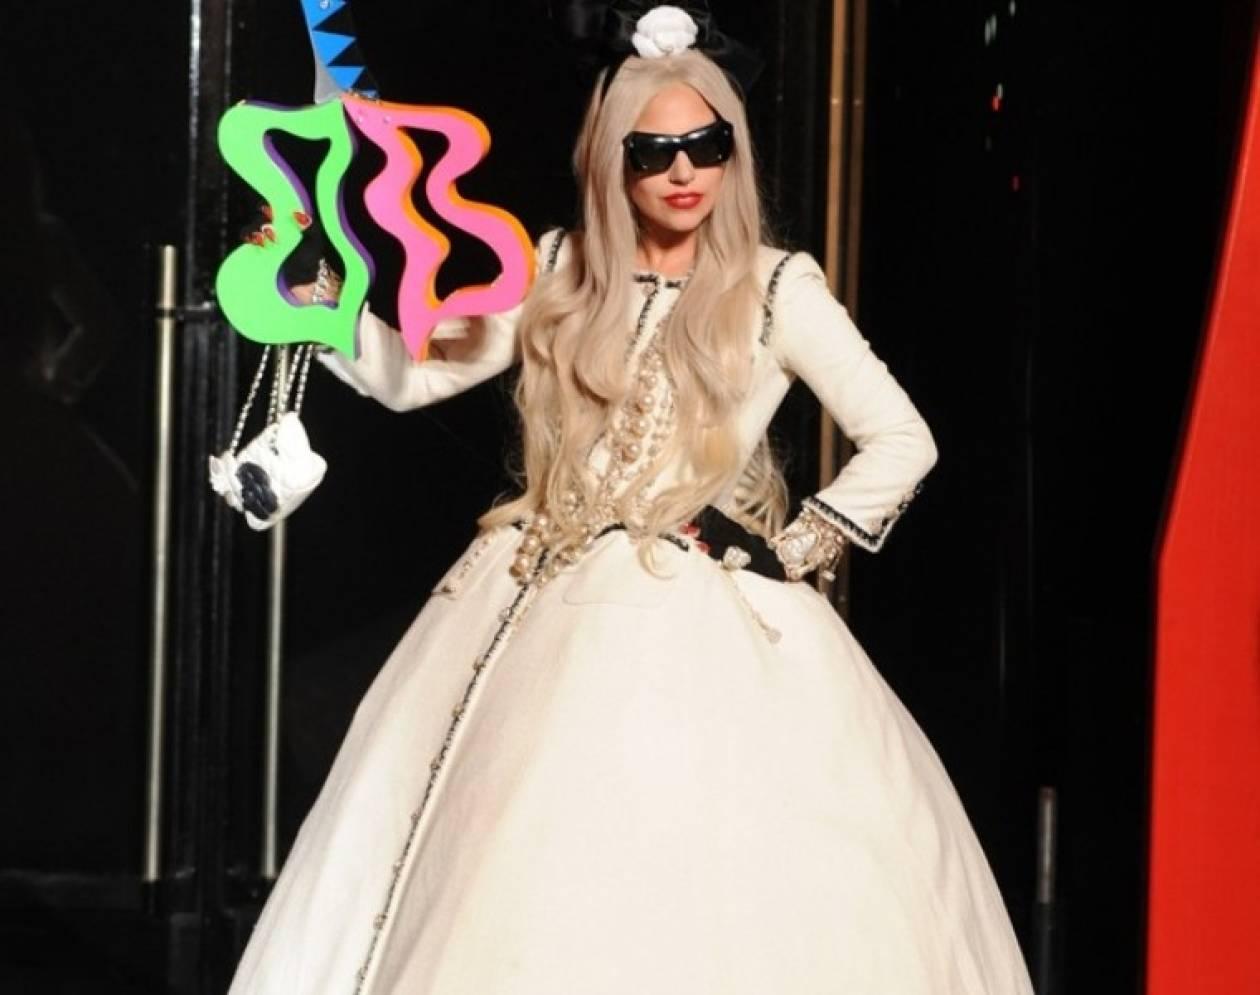 H Lady Gaga θέλει να αποτεφρωθεί φορώντας Chanel!